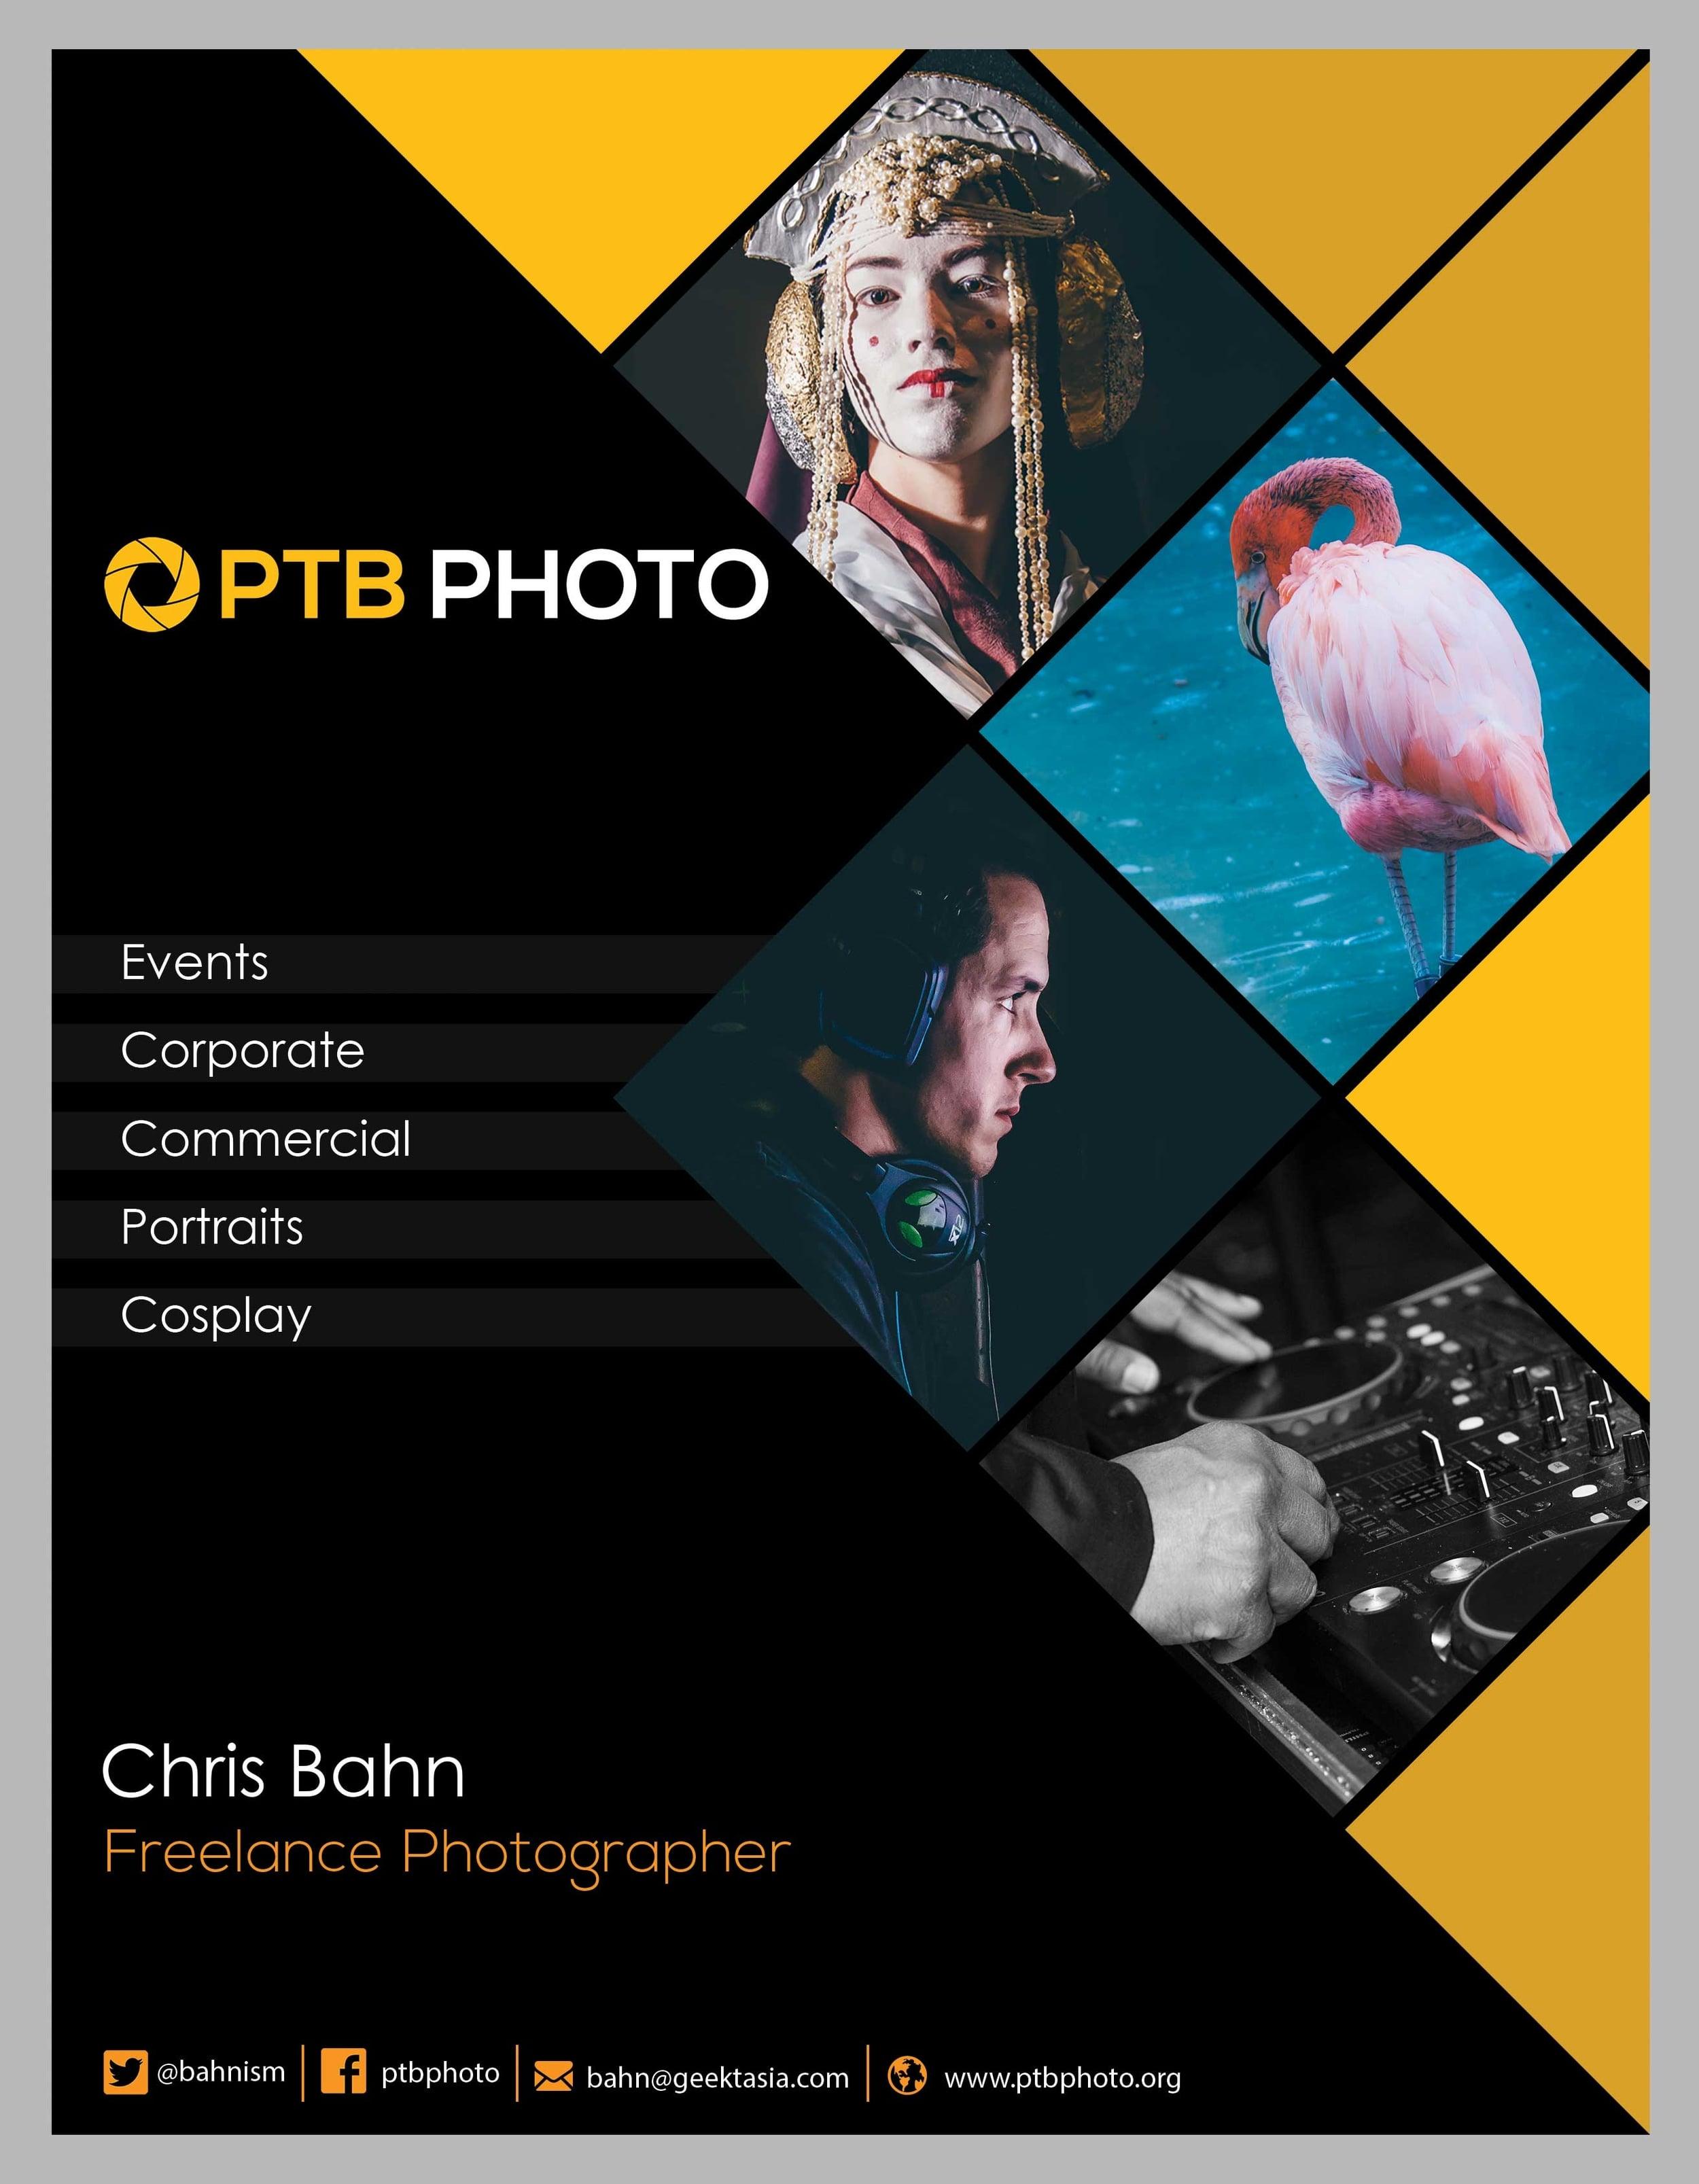 PTBPHOTOflyer_lowres.jpg